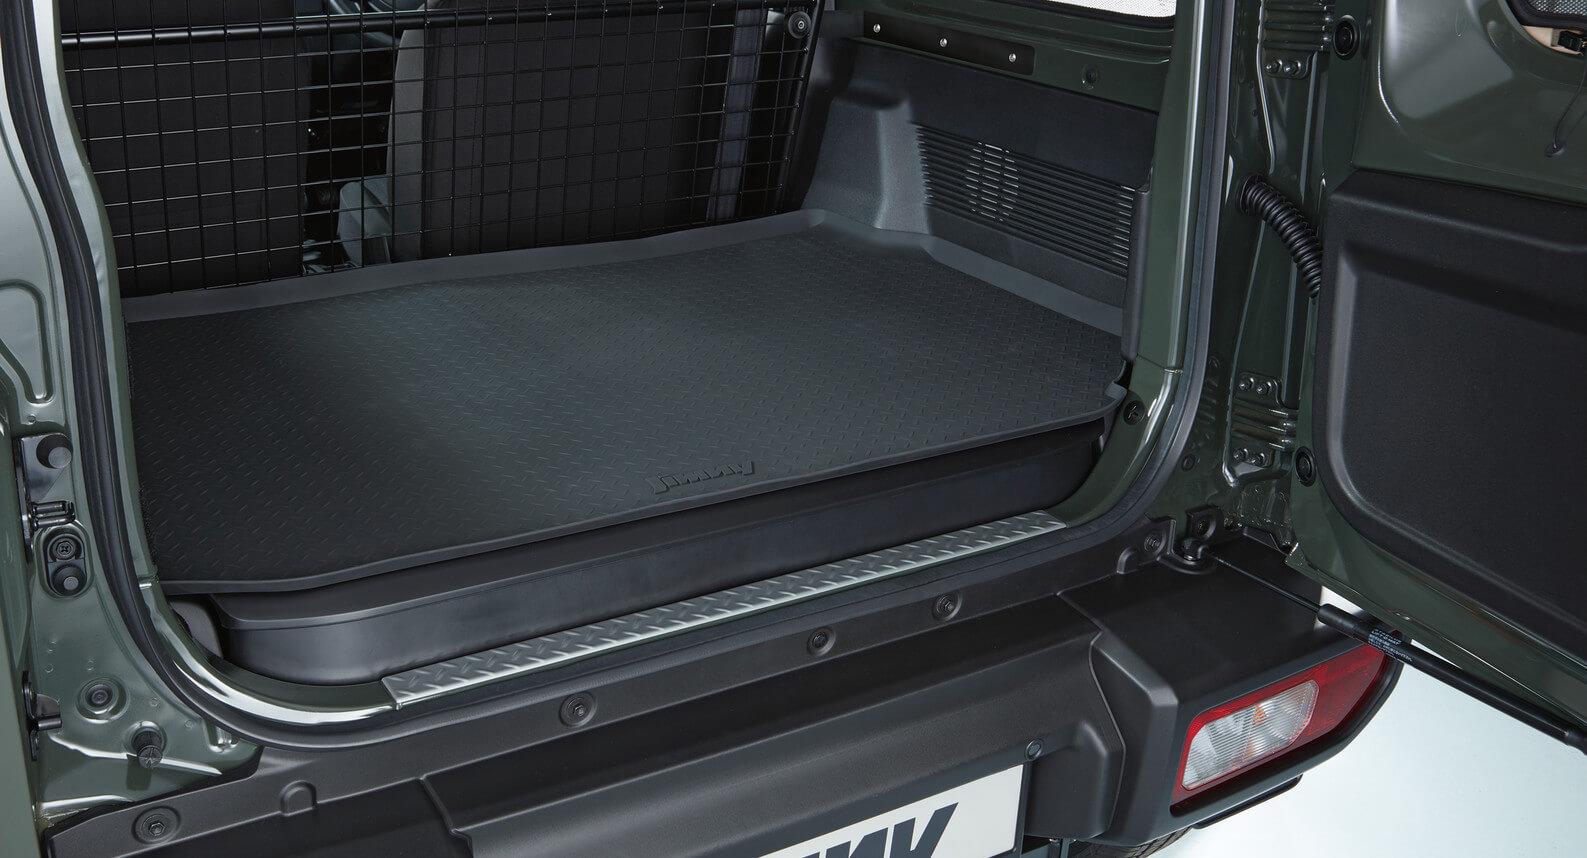 Jimny - Cargo Tray, Rubber With Checkered Plate Design And Jimny Logo